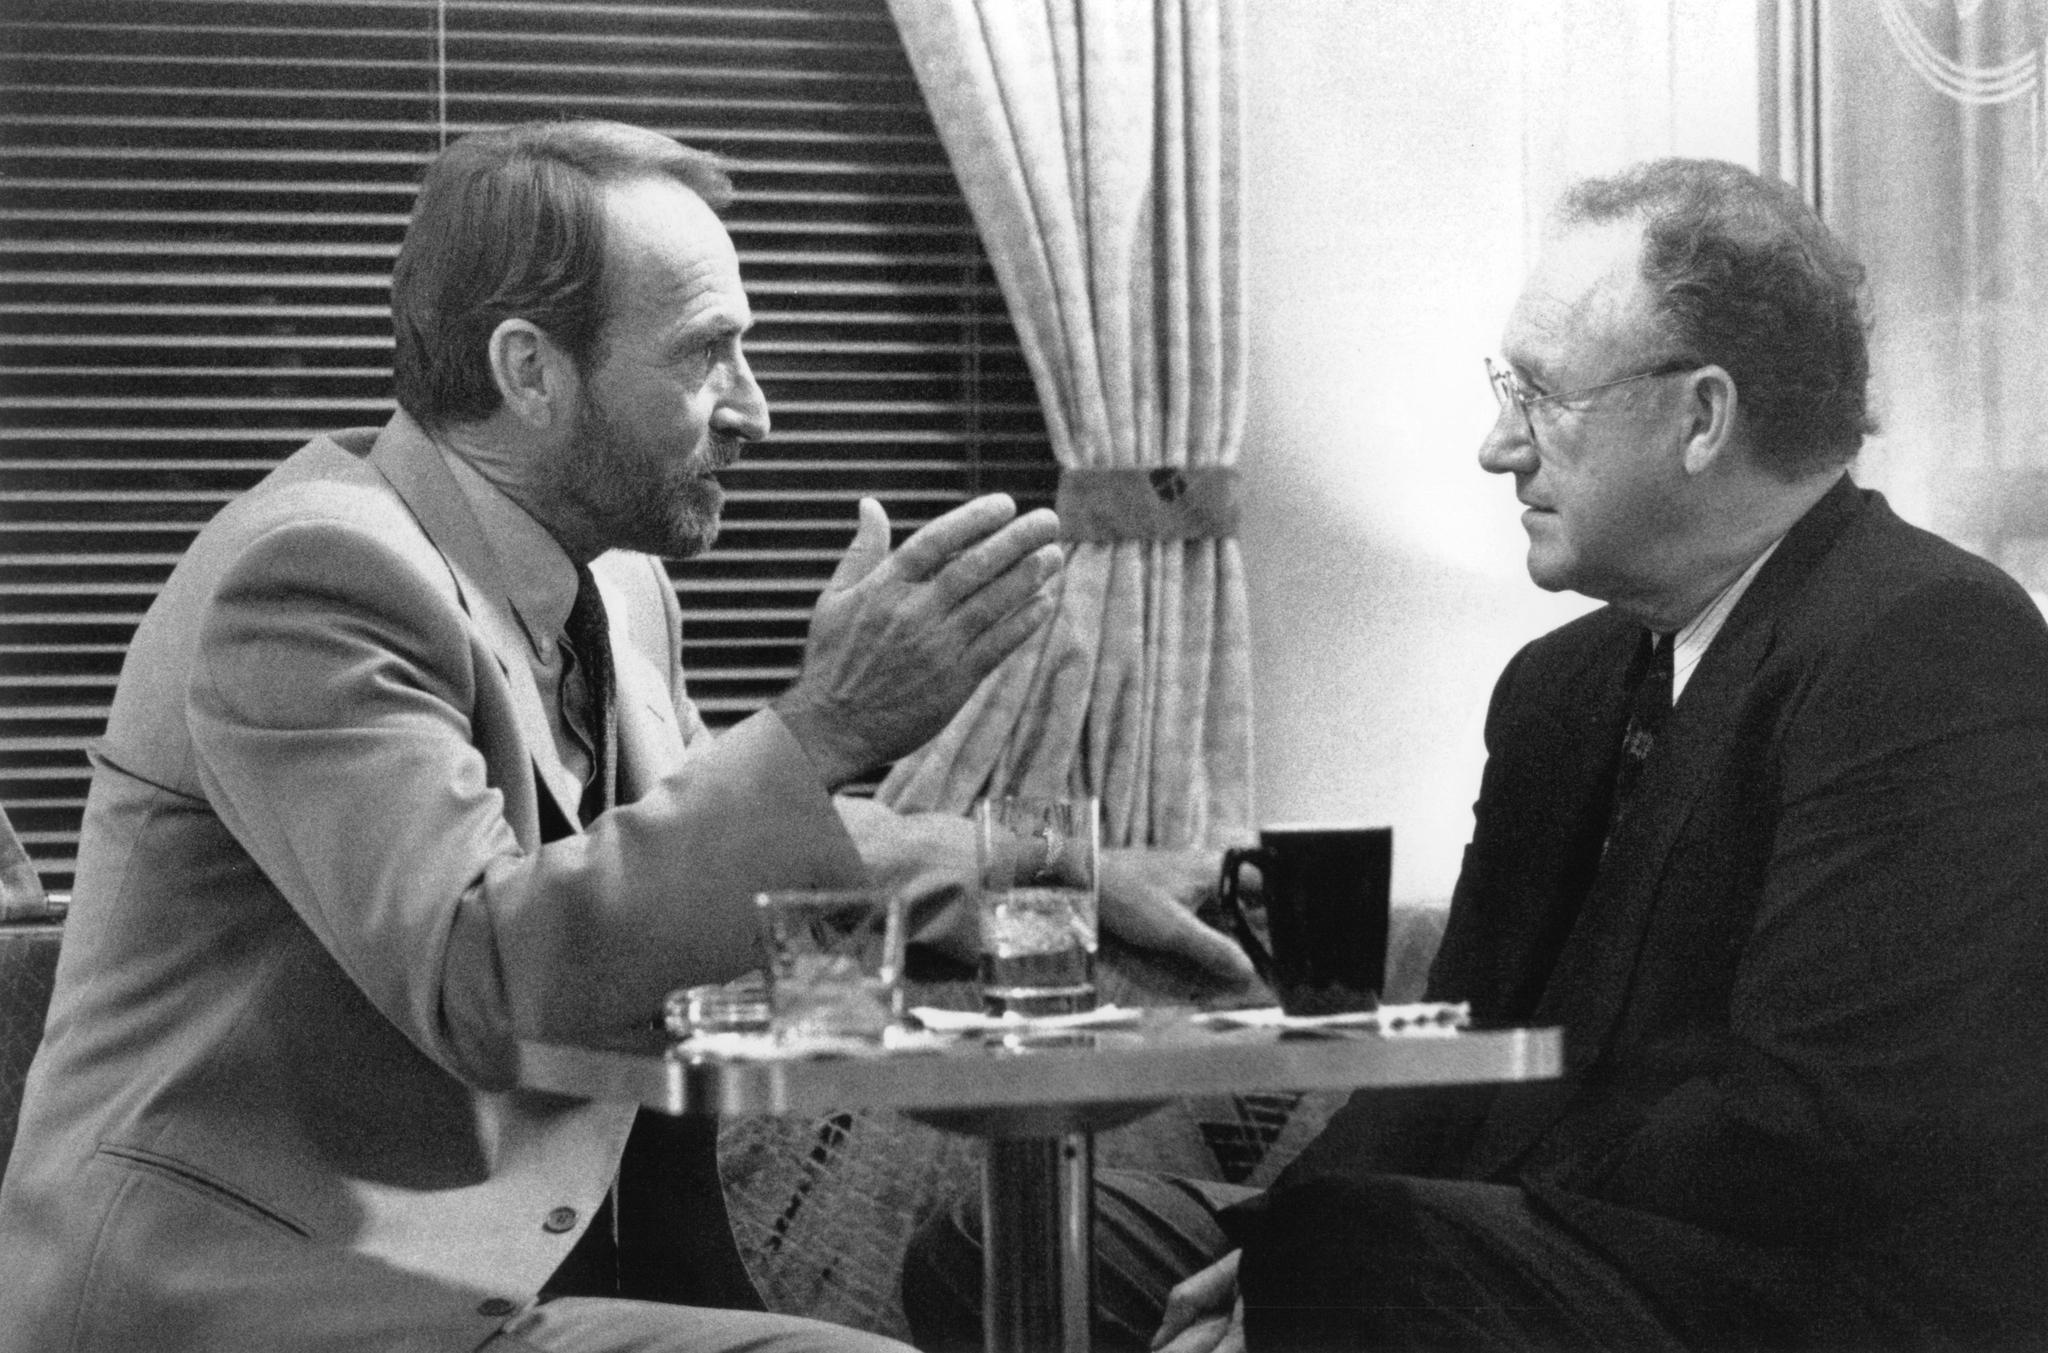 Gene Hackman and James Sikking in Narrow Margin (1990)